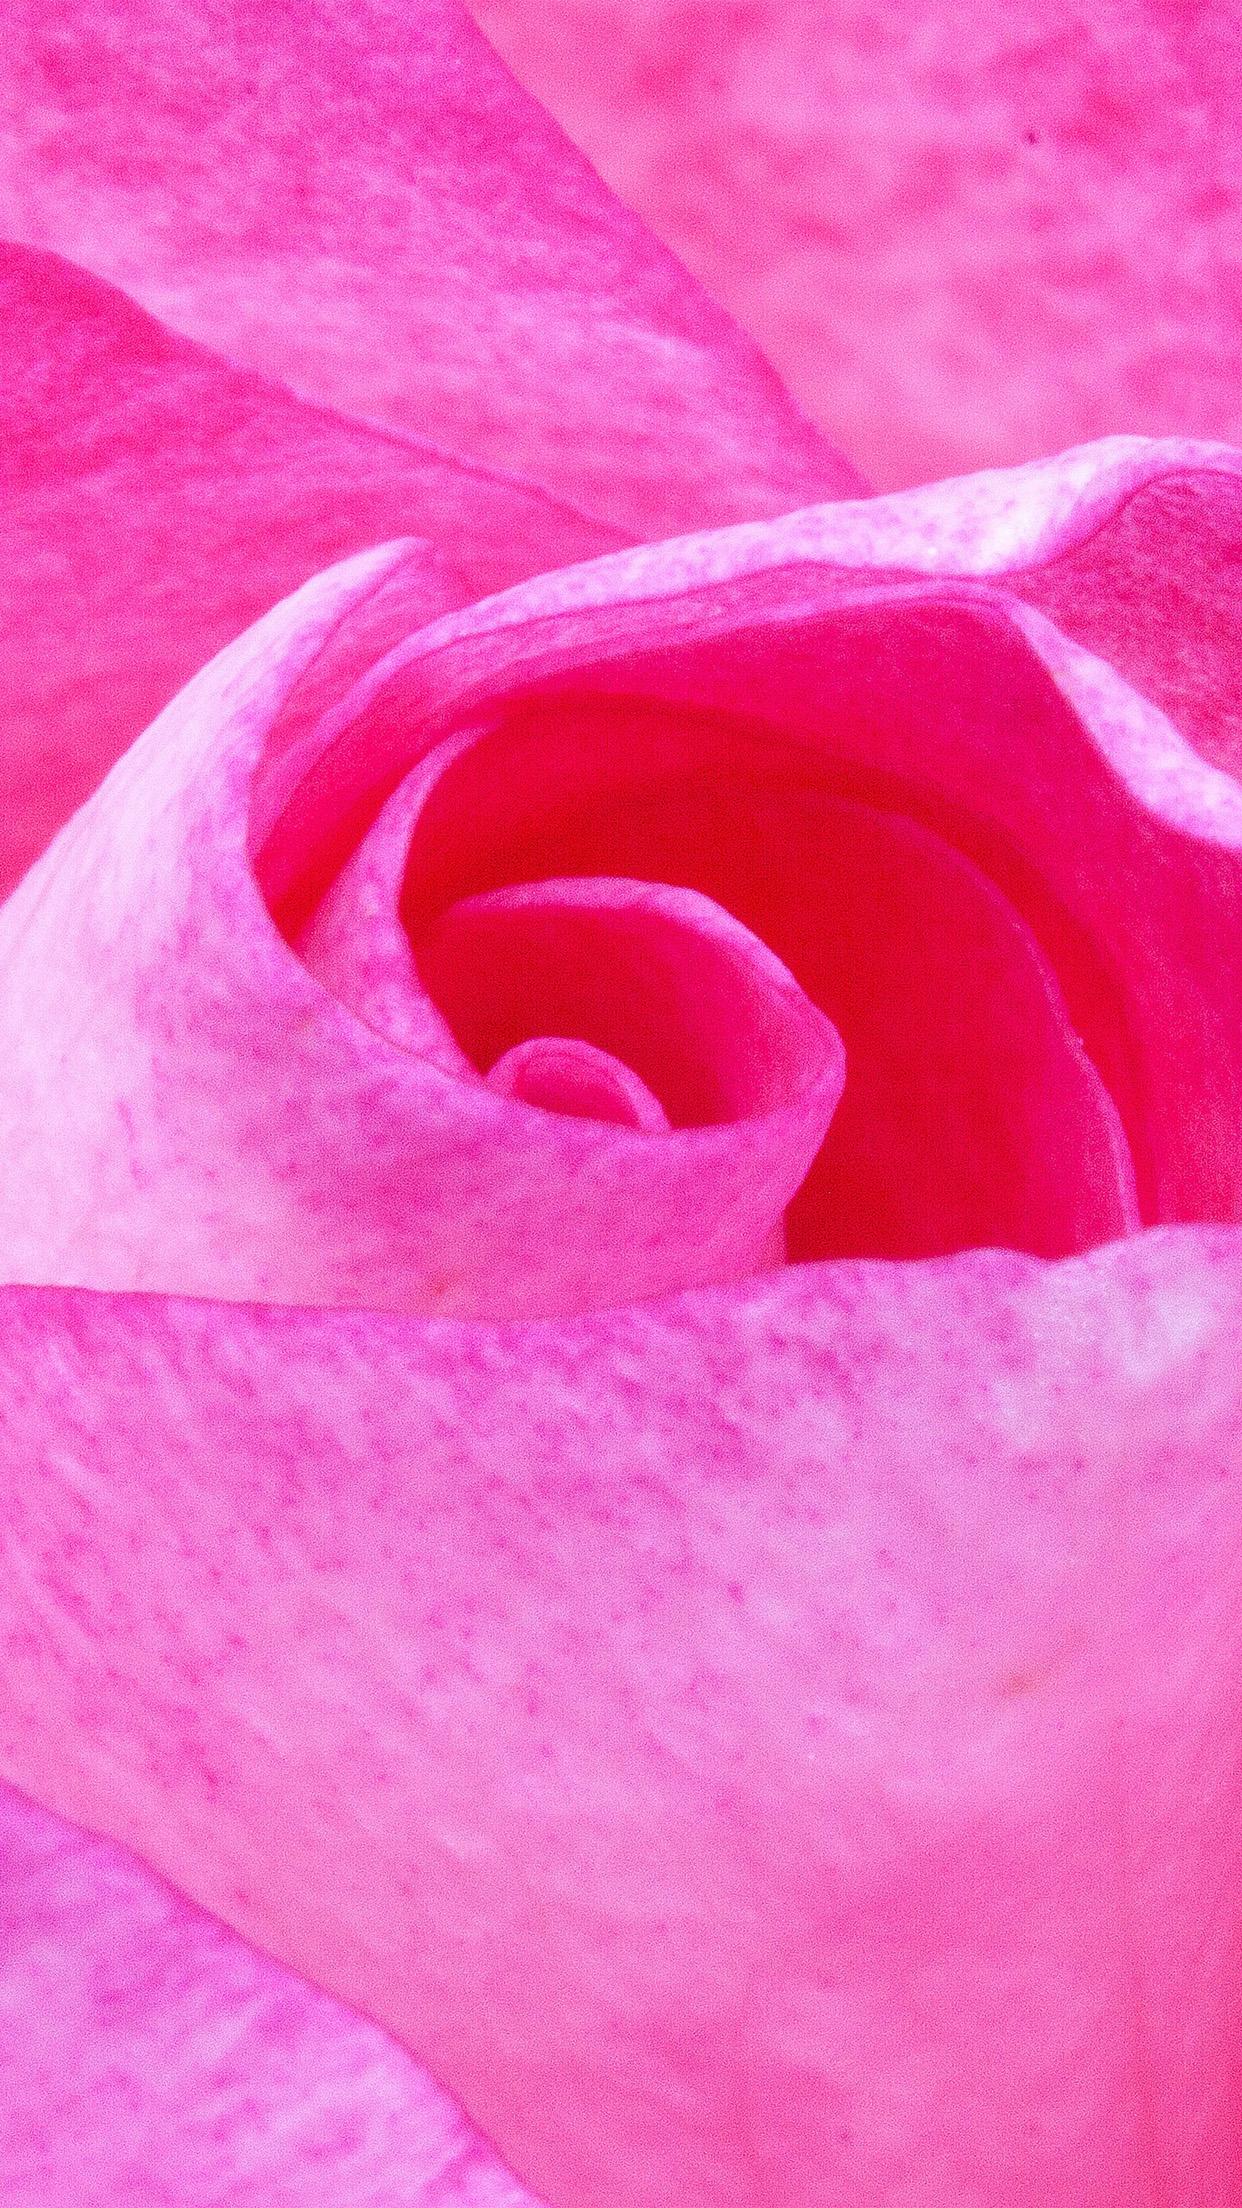 Red And Pink Bedroom: Nu90-flower-red-pink-rose